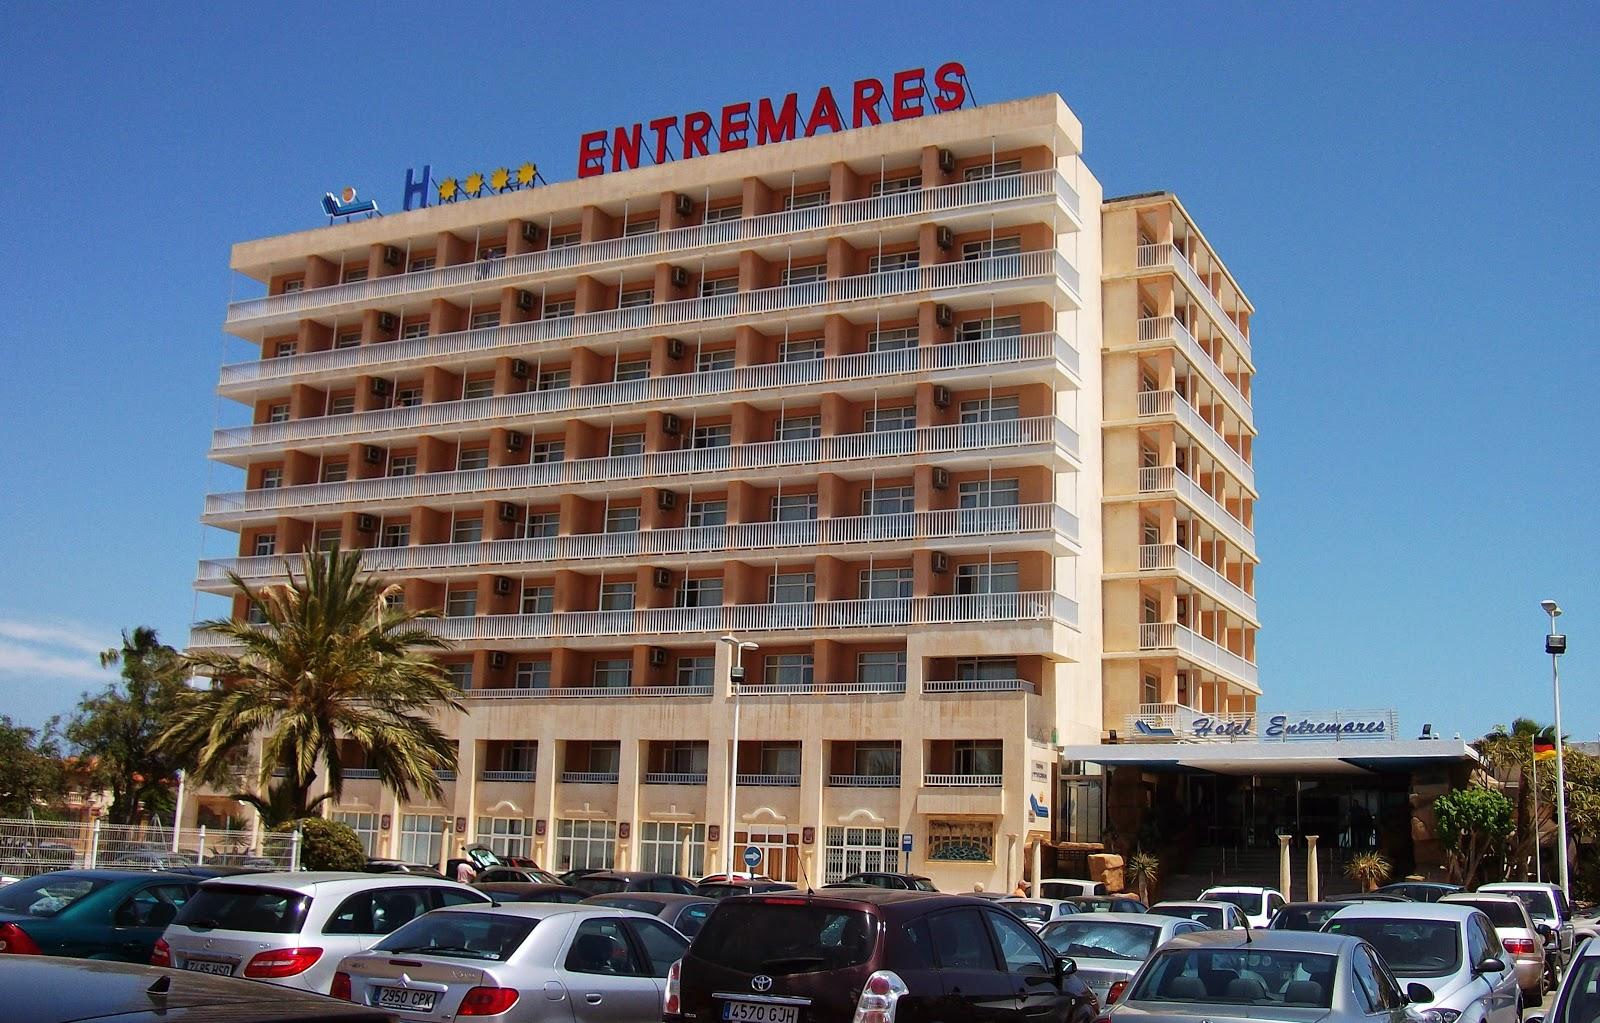 Hotel Entremares La Manga Murcia